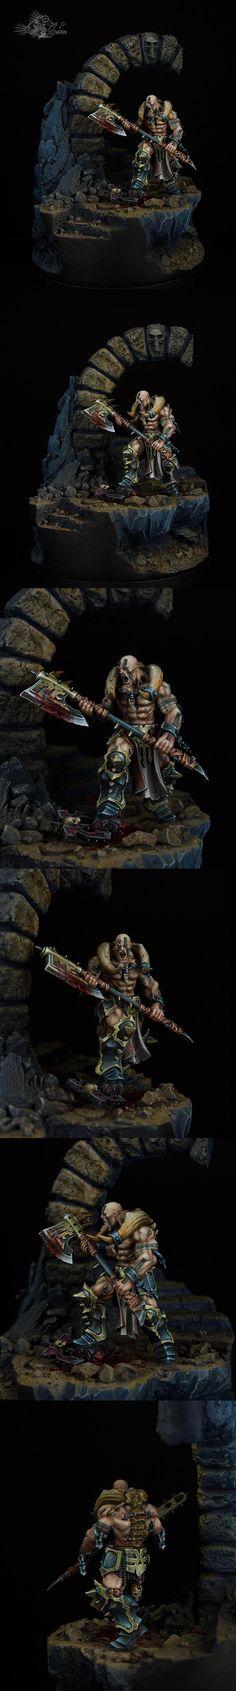 DakkaDakka - Wargaming and Warhammer 40k Forums, Articles and Gallery - Homepage | 'Ere we go, 'ere we go, 'ere we go!